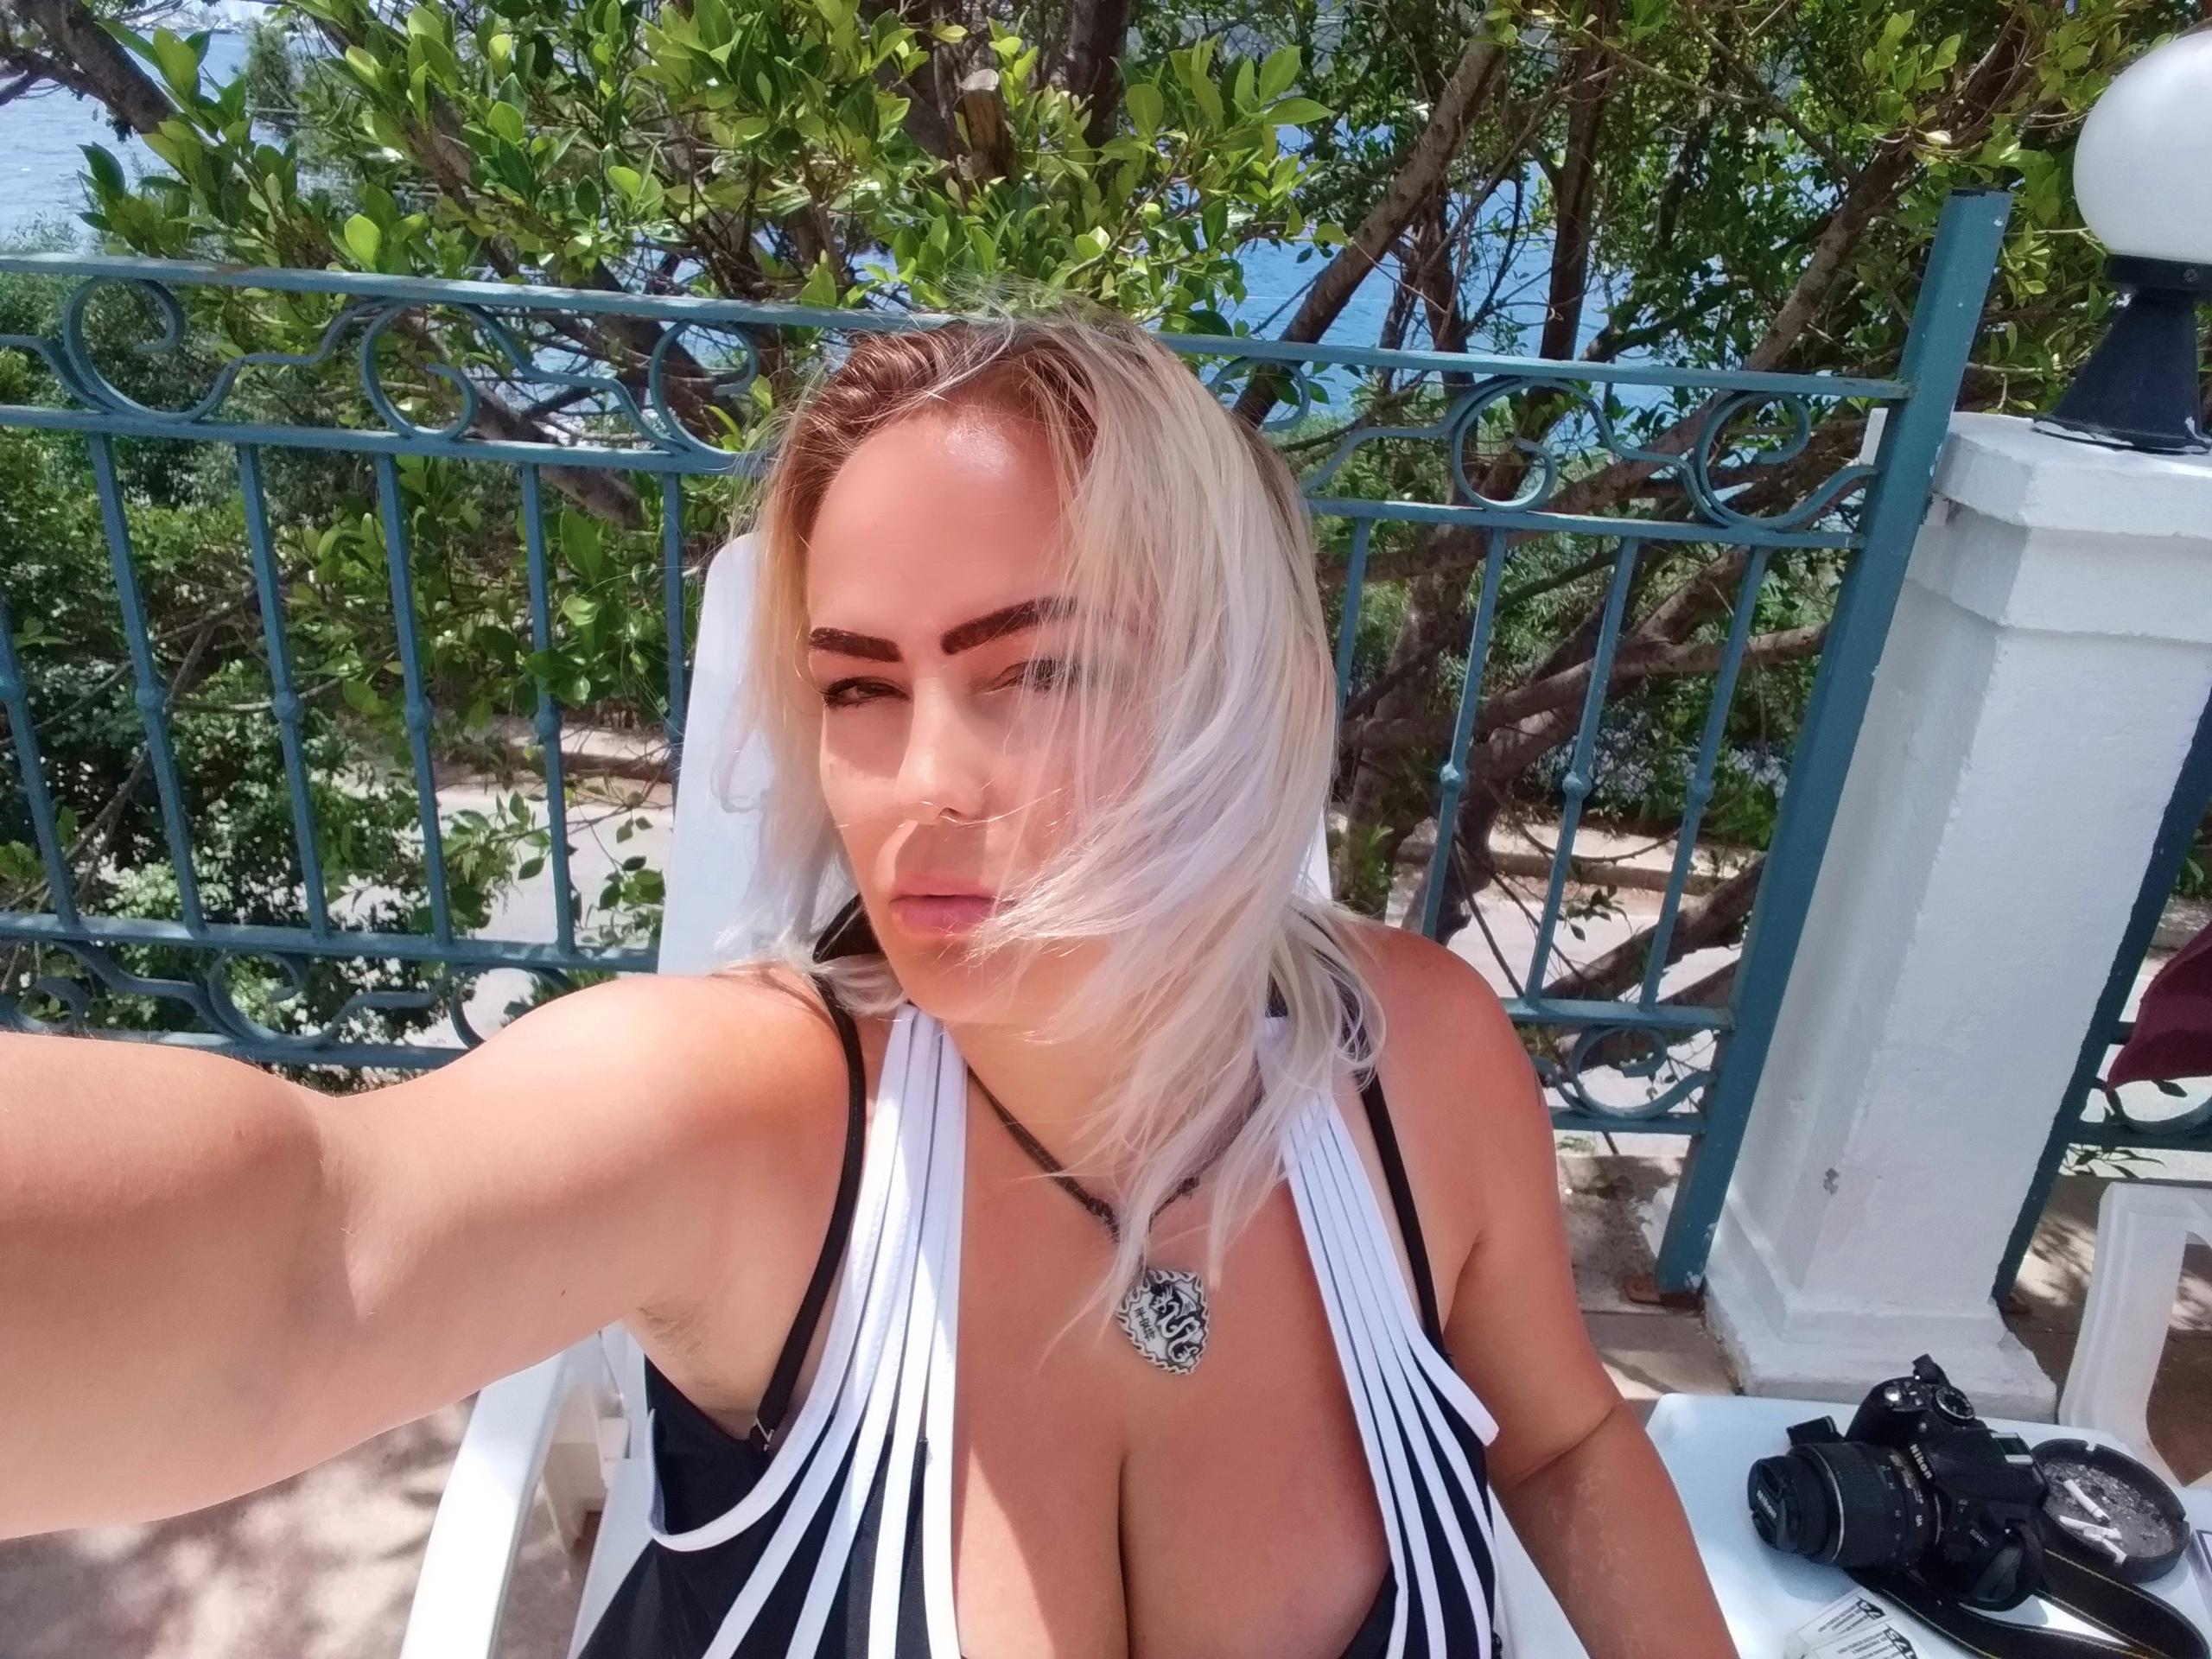 Елена Руденко ( Валтея). Мои путешествия. Турция. Мармарис. (фото ). M8koeJBmjwM